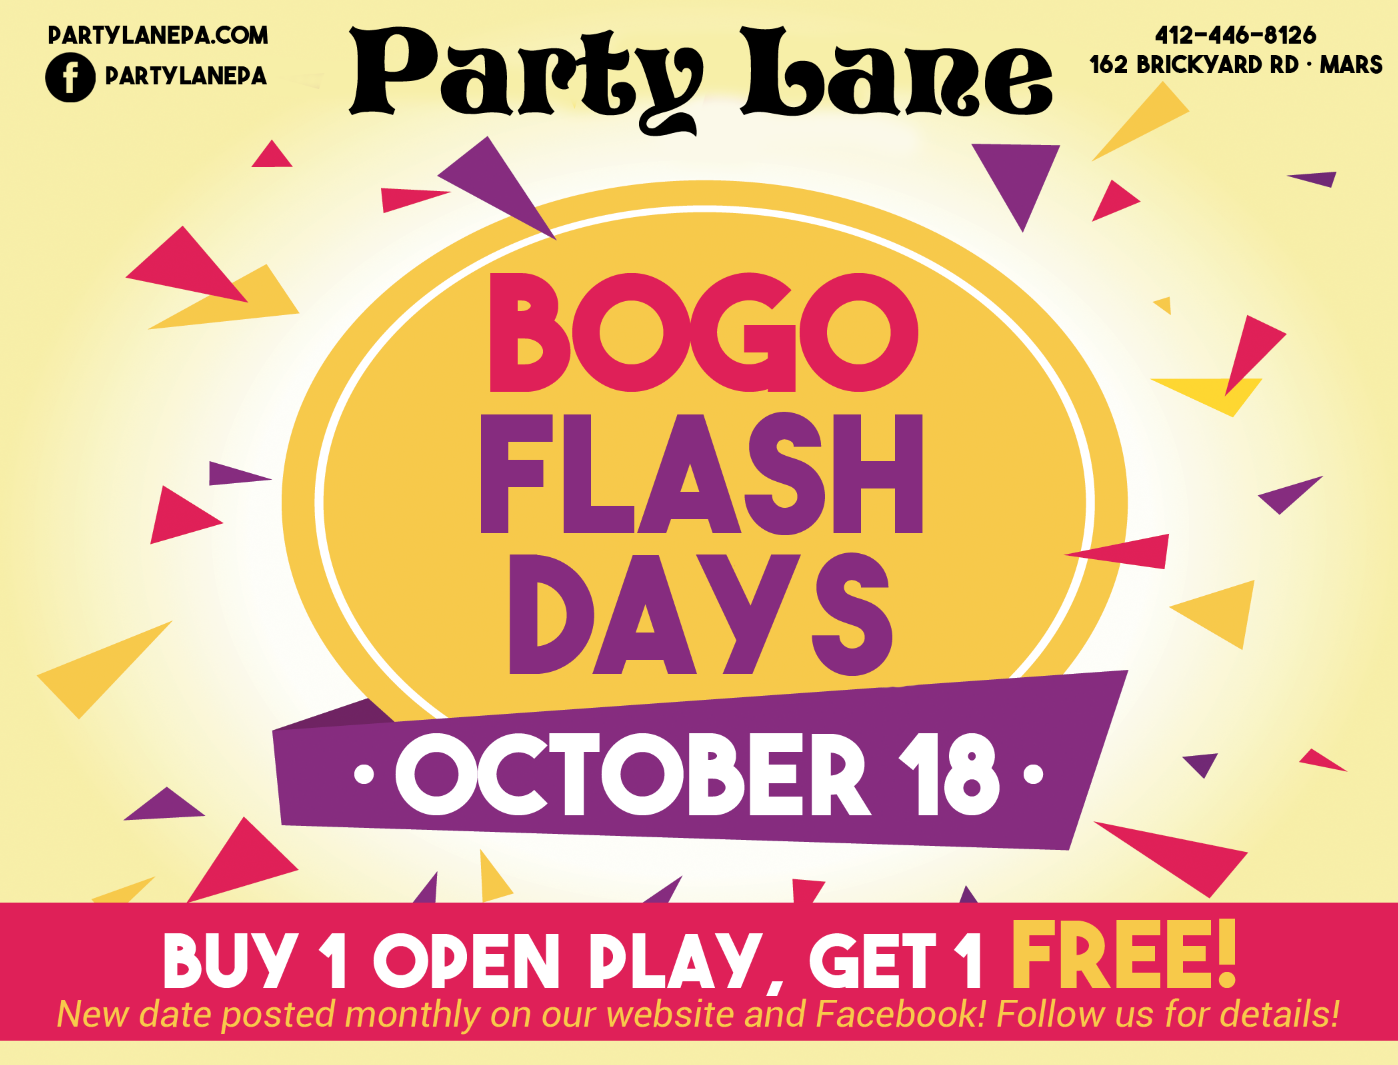 BOGO Flash Days